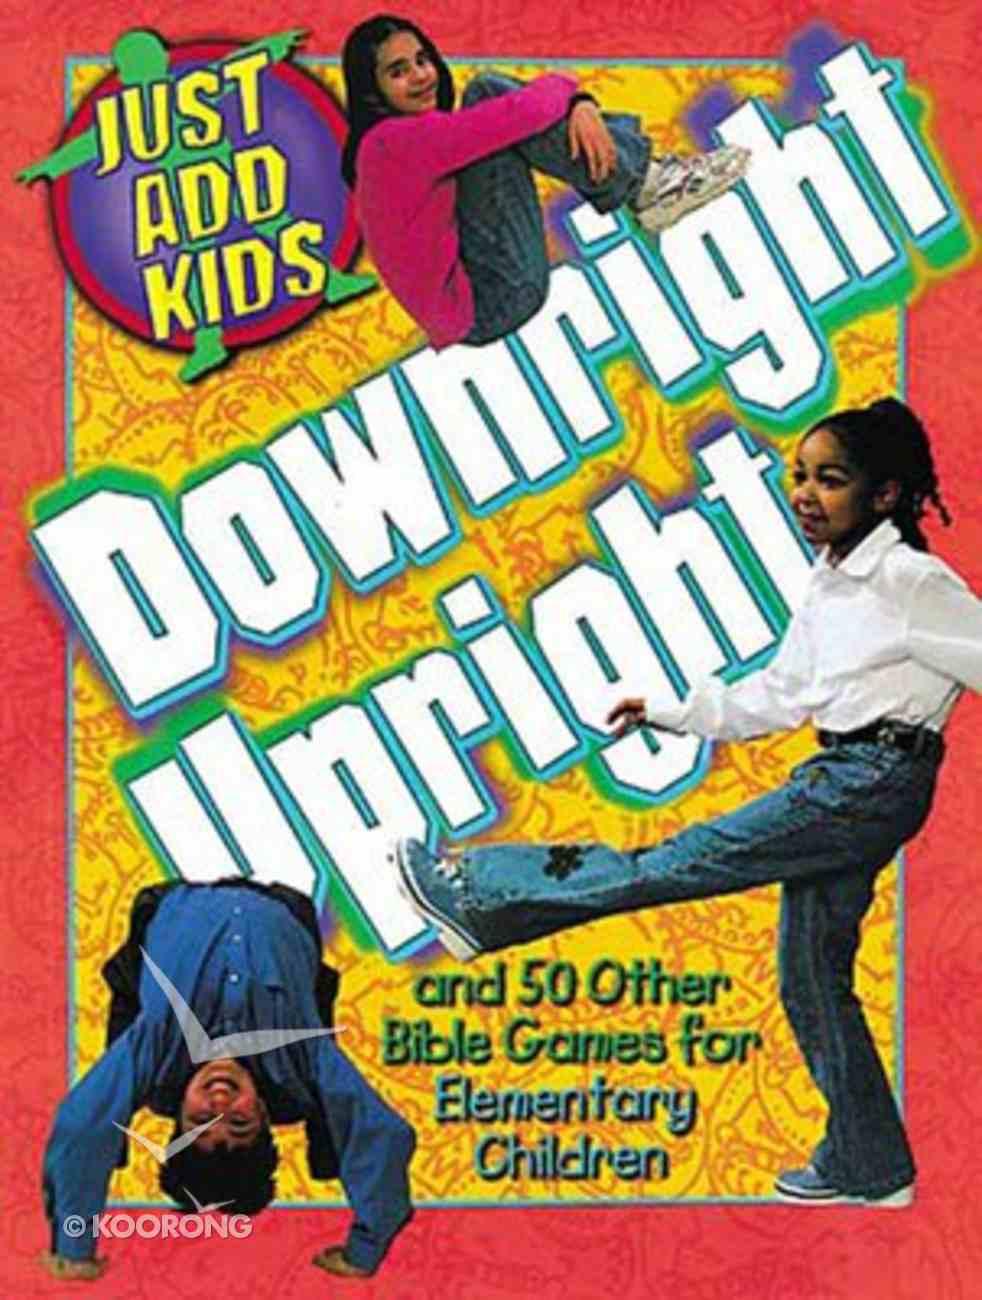 Just Add Kids: Downright Upright Paperback